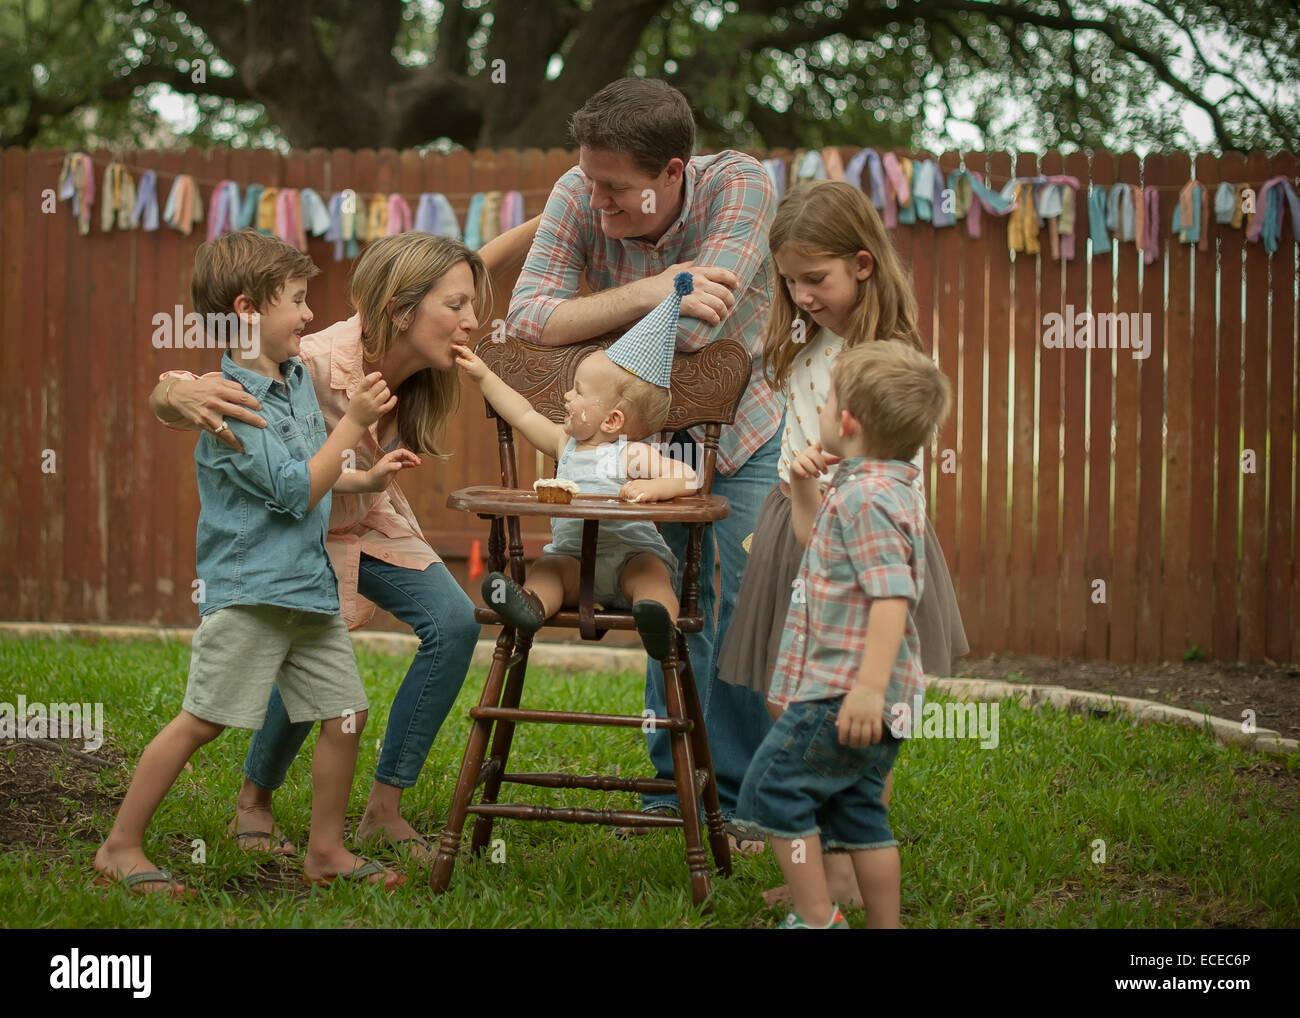 Family celebrating baby boys' first birthday in back yard - Stock Image